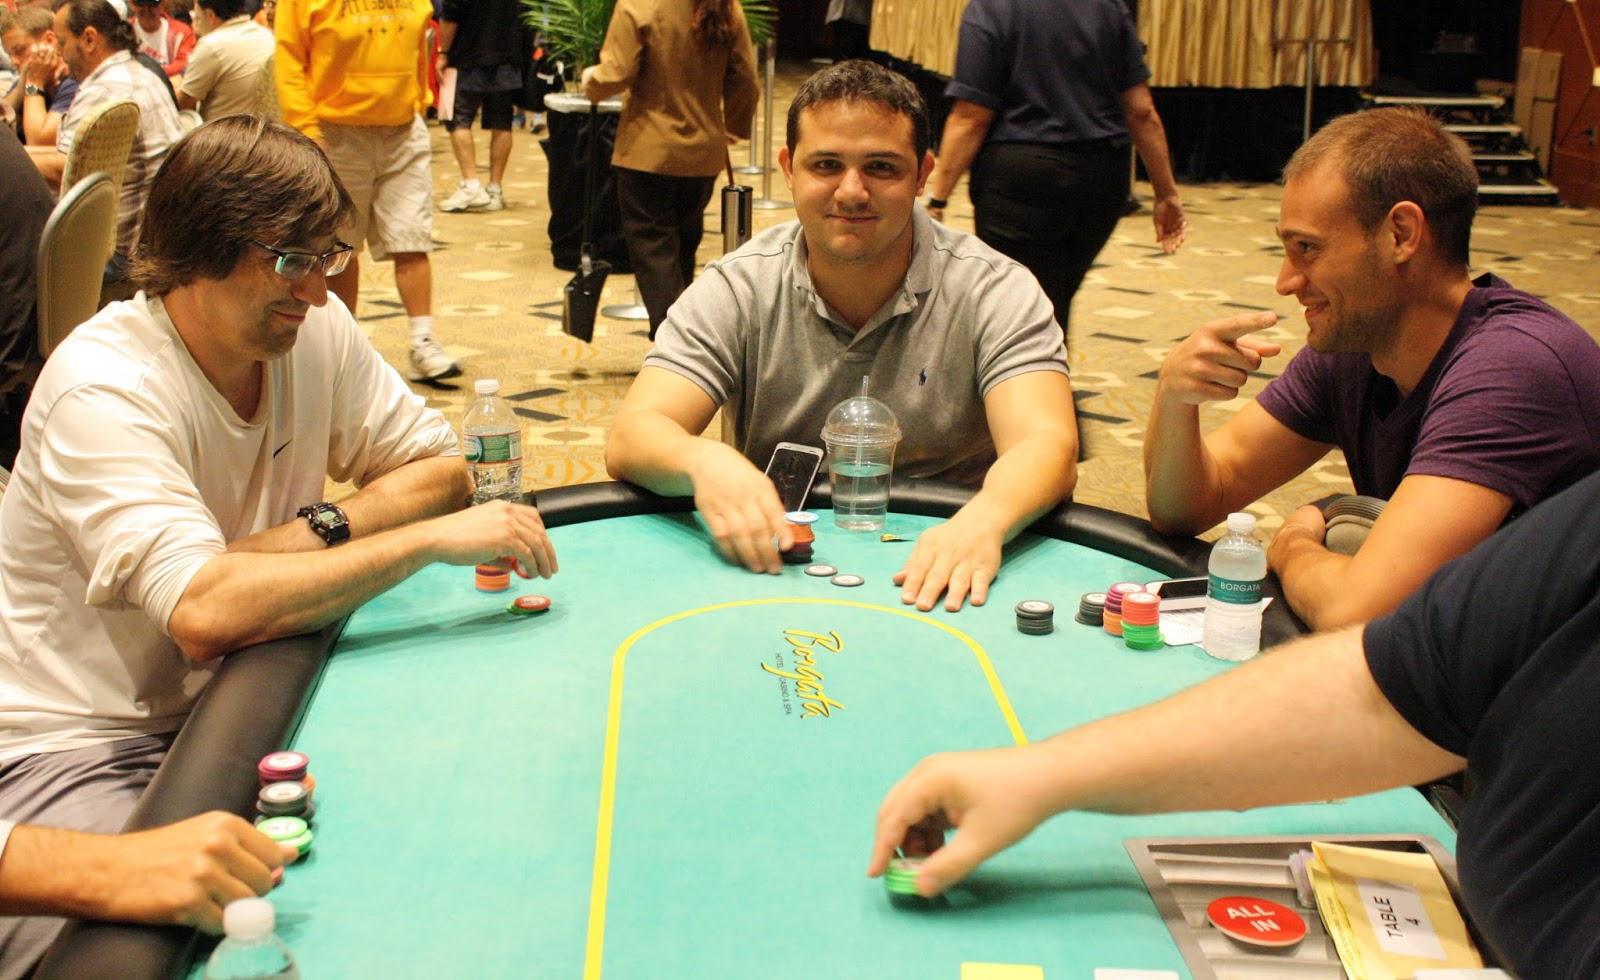 Borgata poker open 2013 event 12 champs at same table for Peter ippolito